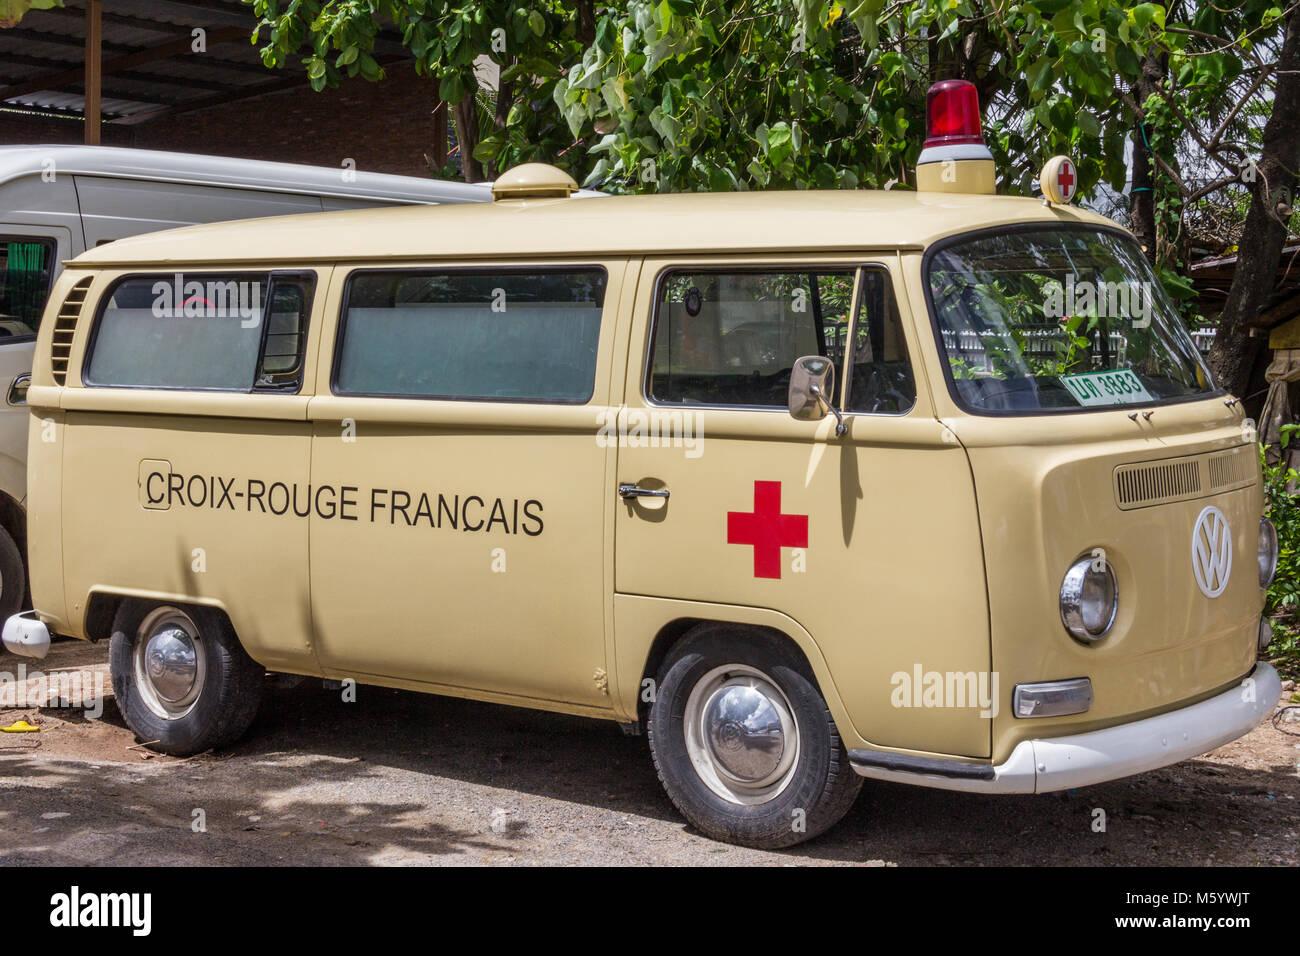 Ambulance Red Cross Stock Photos & Ambulance Red Cross Stock